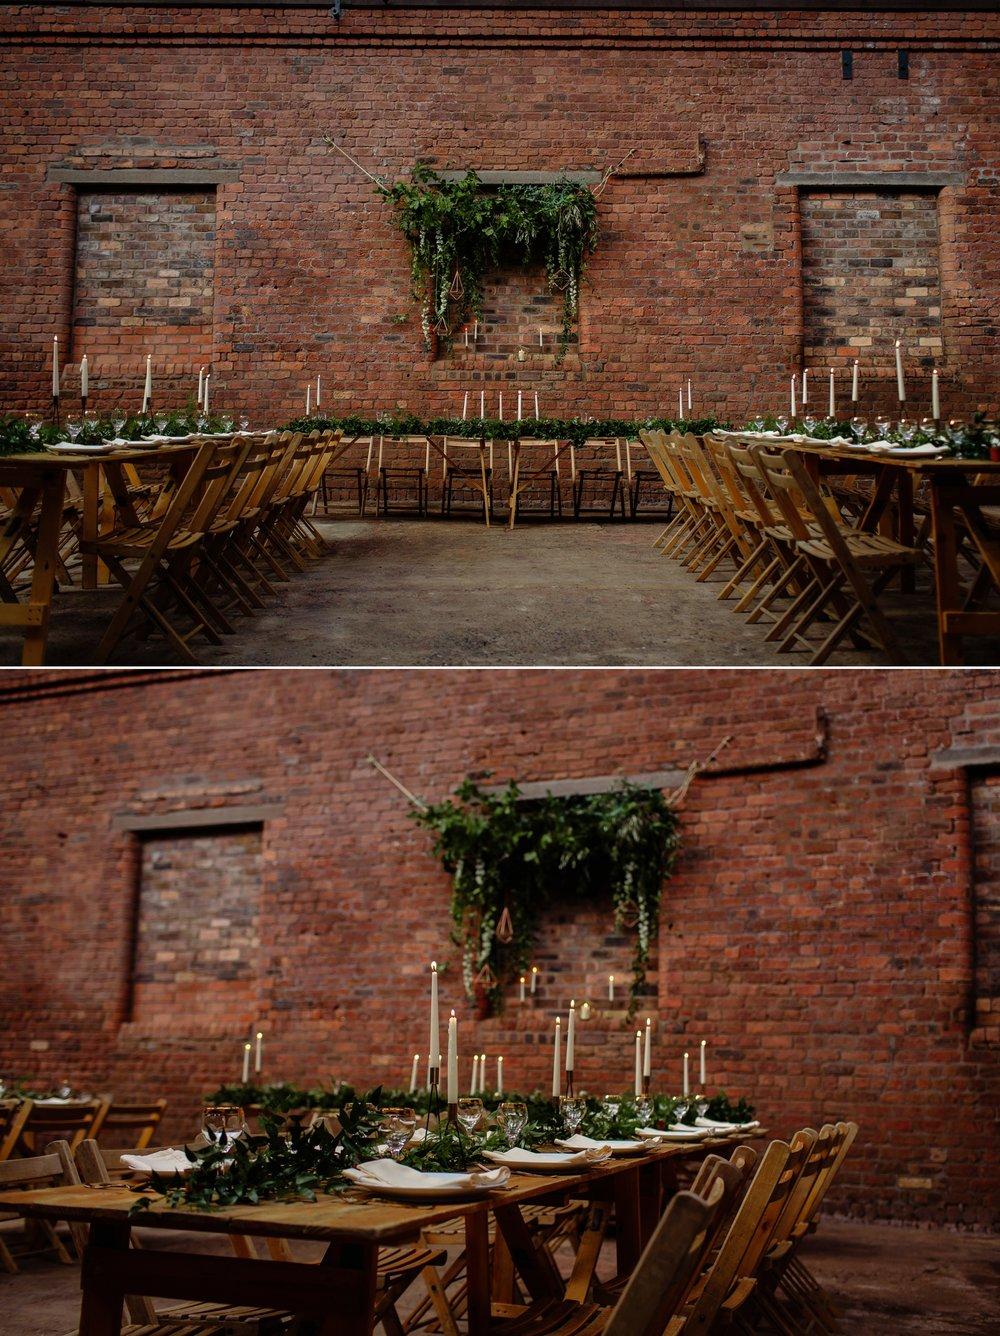 engine-works-wedding-styled-shoot-fotomaki-photography-139.jpg